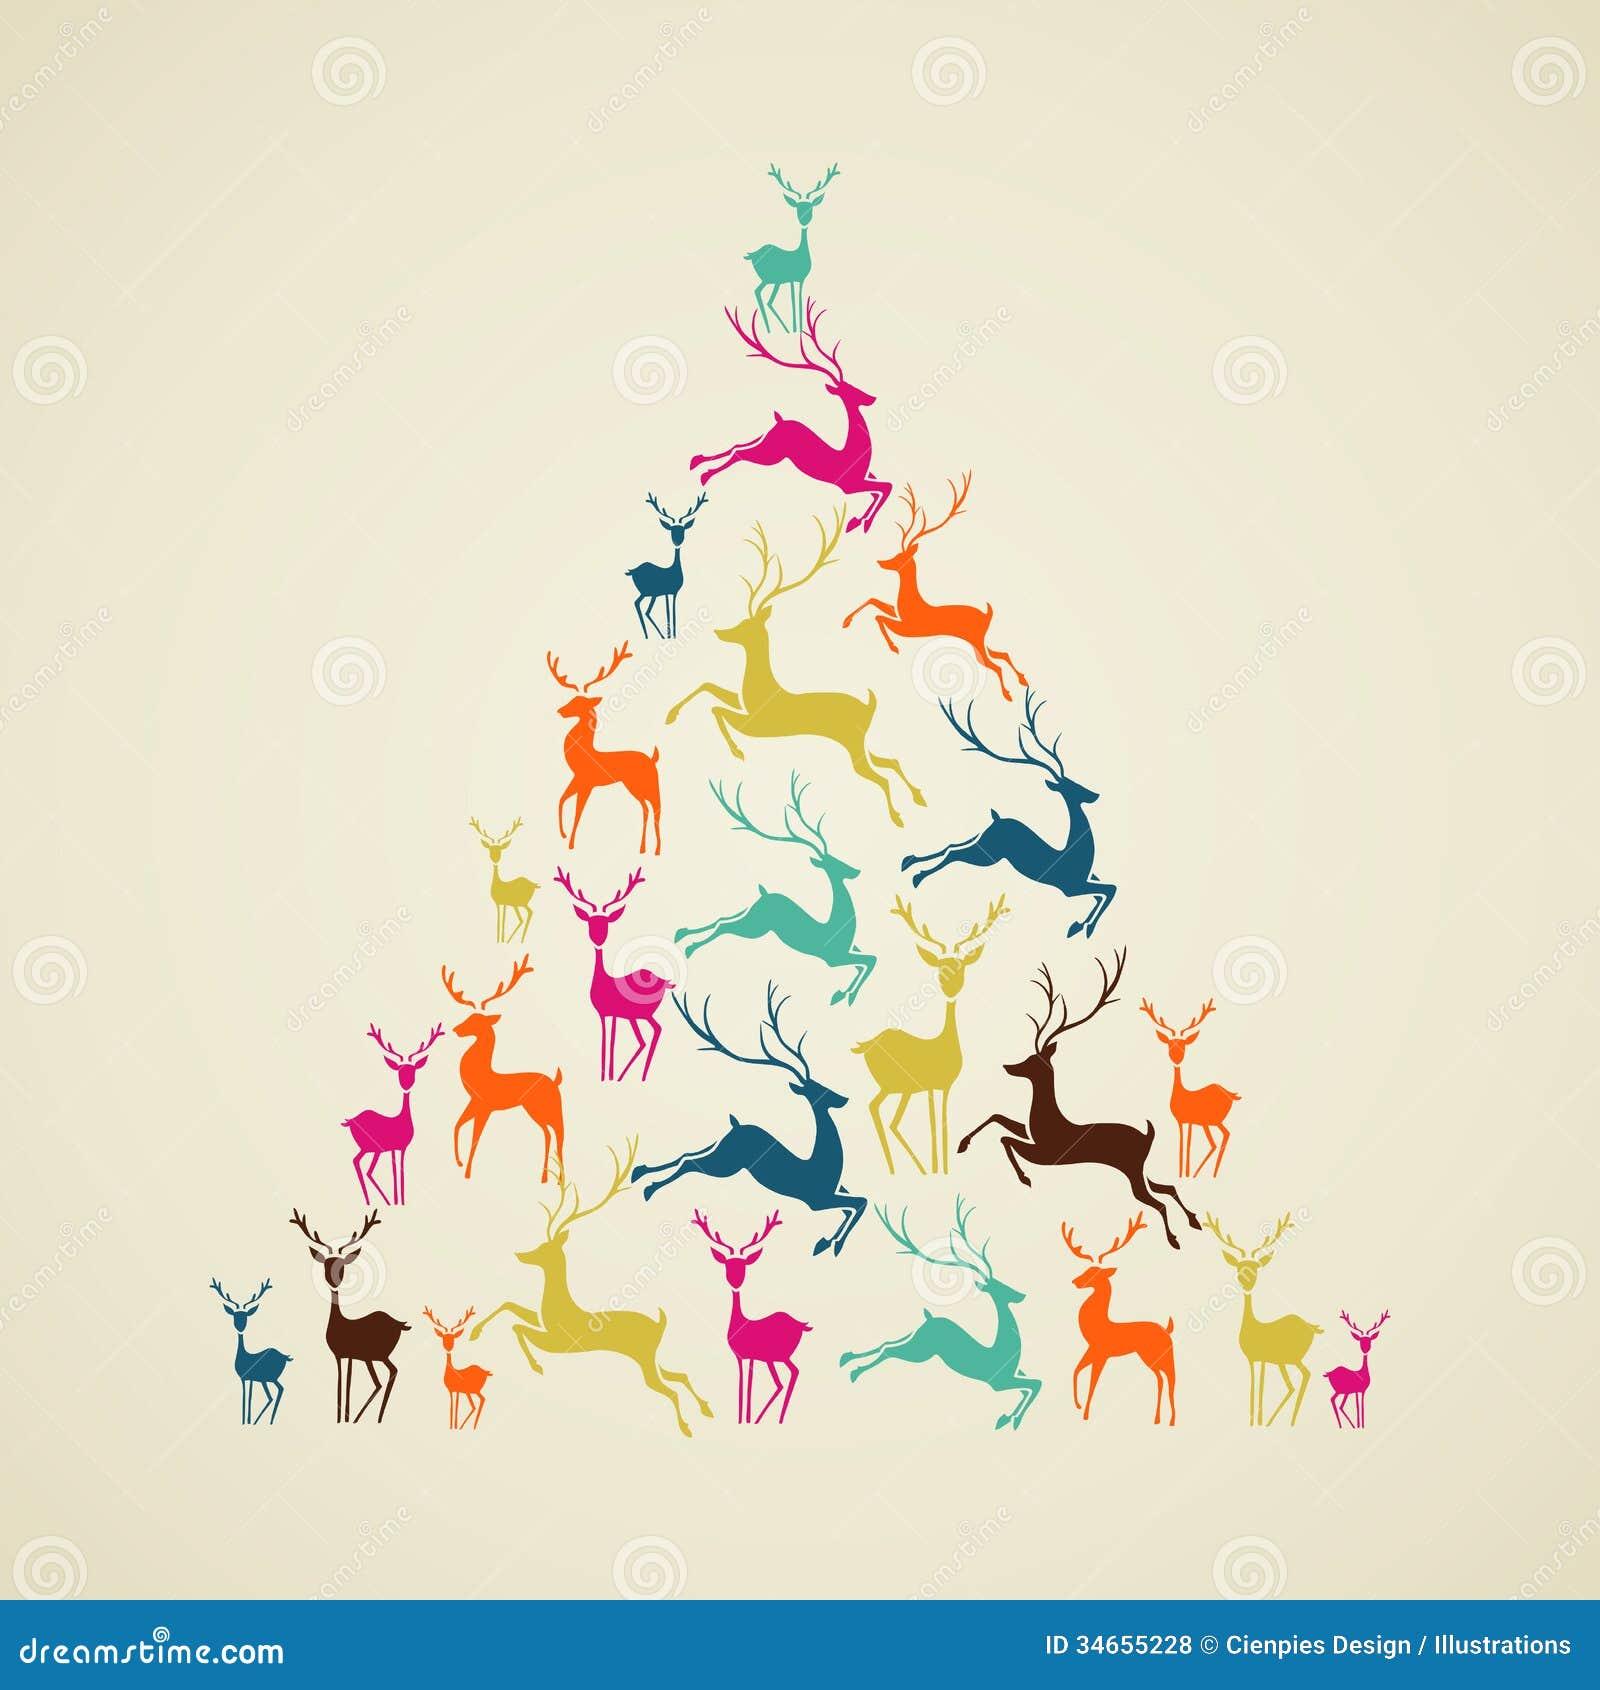 Merry Christmas Reindeer Pine Tree Shape Vector Royalty Free Stock Photos Image 34655228